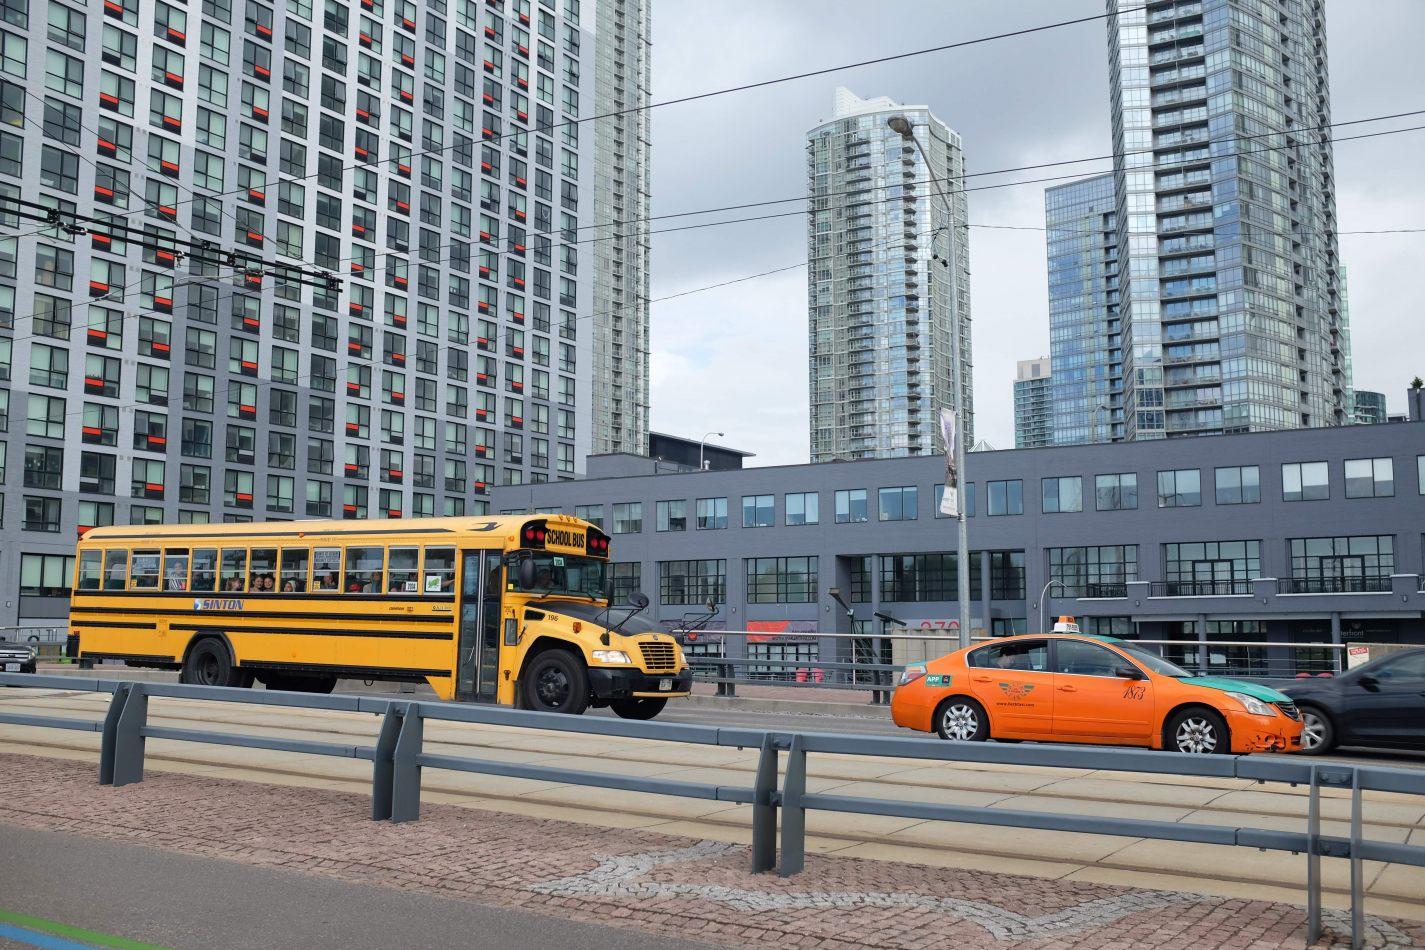 Hibiscus & Nomada : Canada - Downtown Toronto